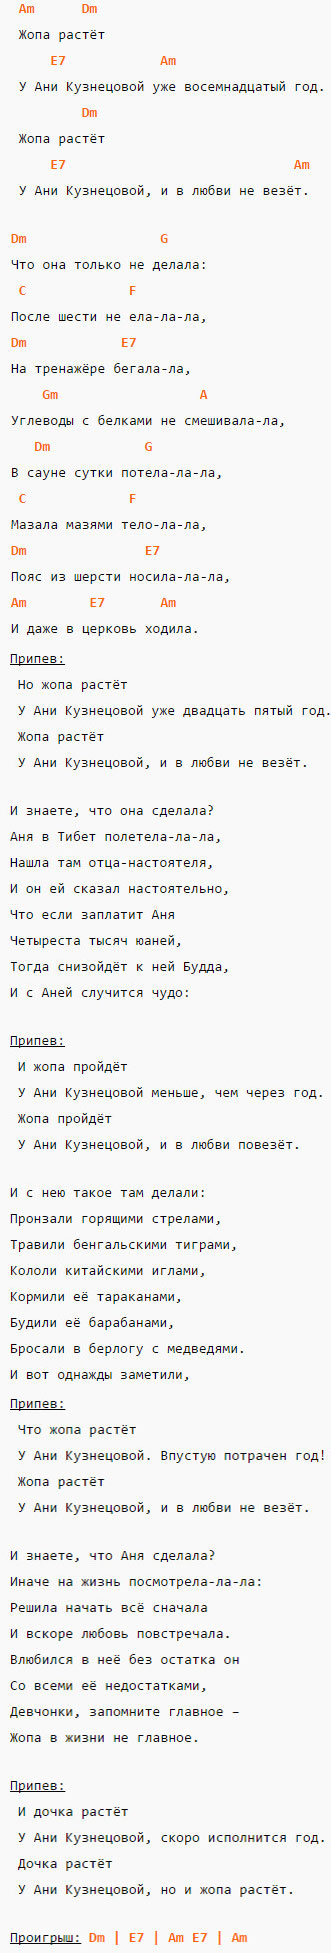 Жопа растет - Слепаков - Аккорды и текст